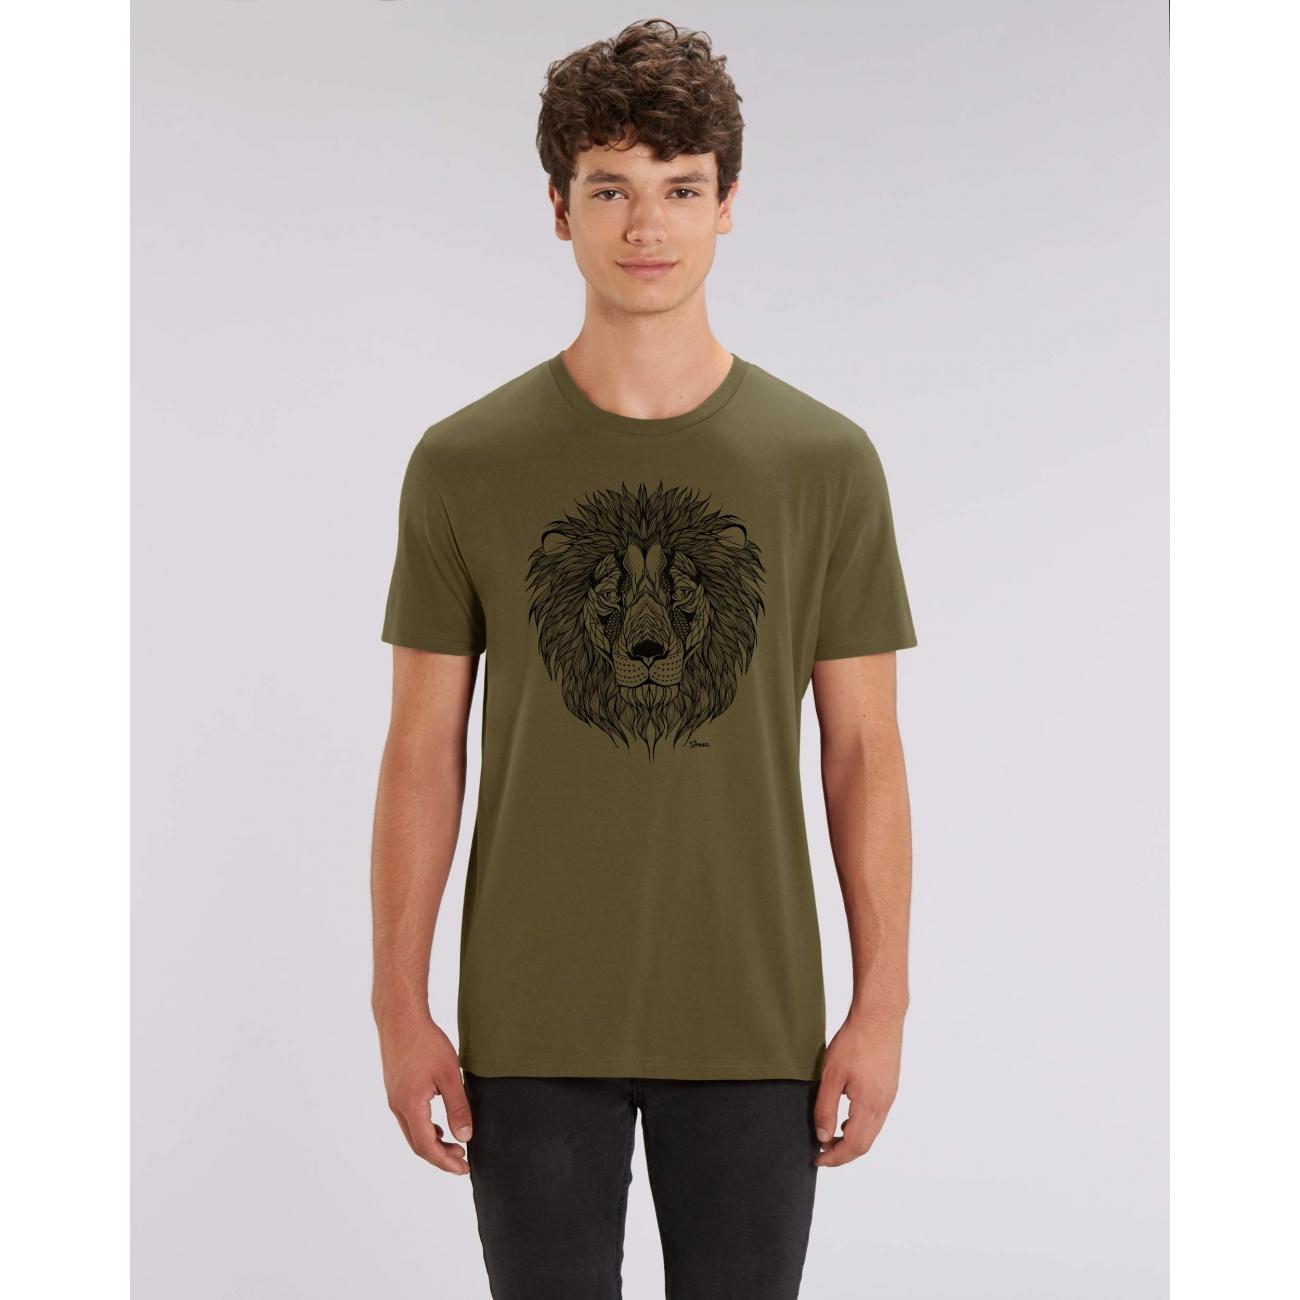 https://tee-shirt-bio.com/8161-thickbox_default/tee-shirt-couleur-kaki-anglais-coton-bio-impression-lion-noir-creator.jpg